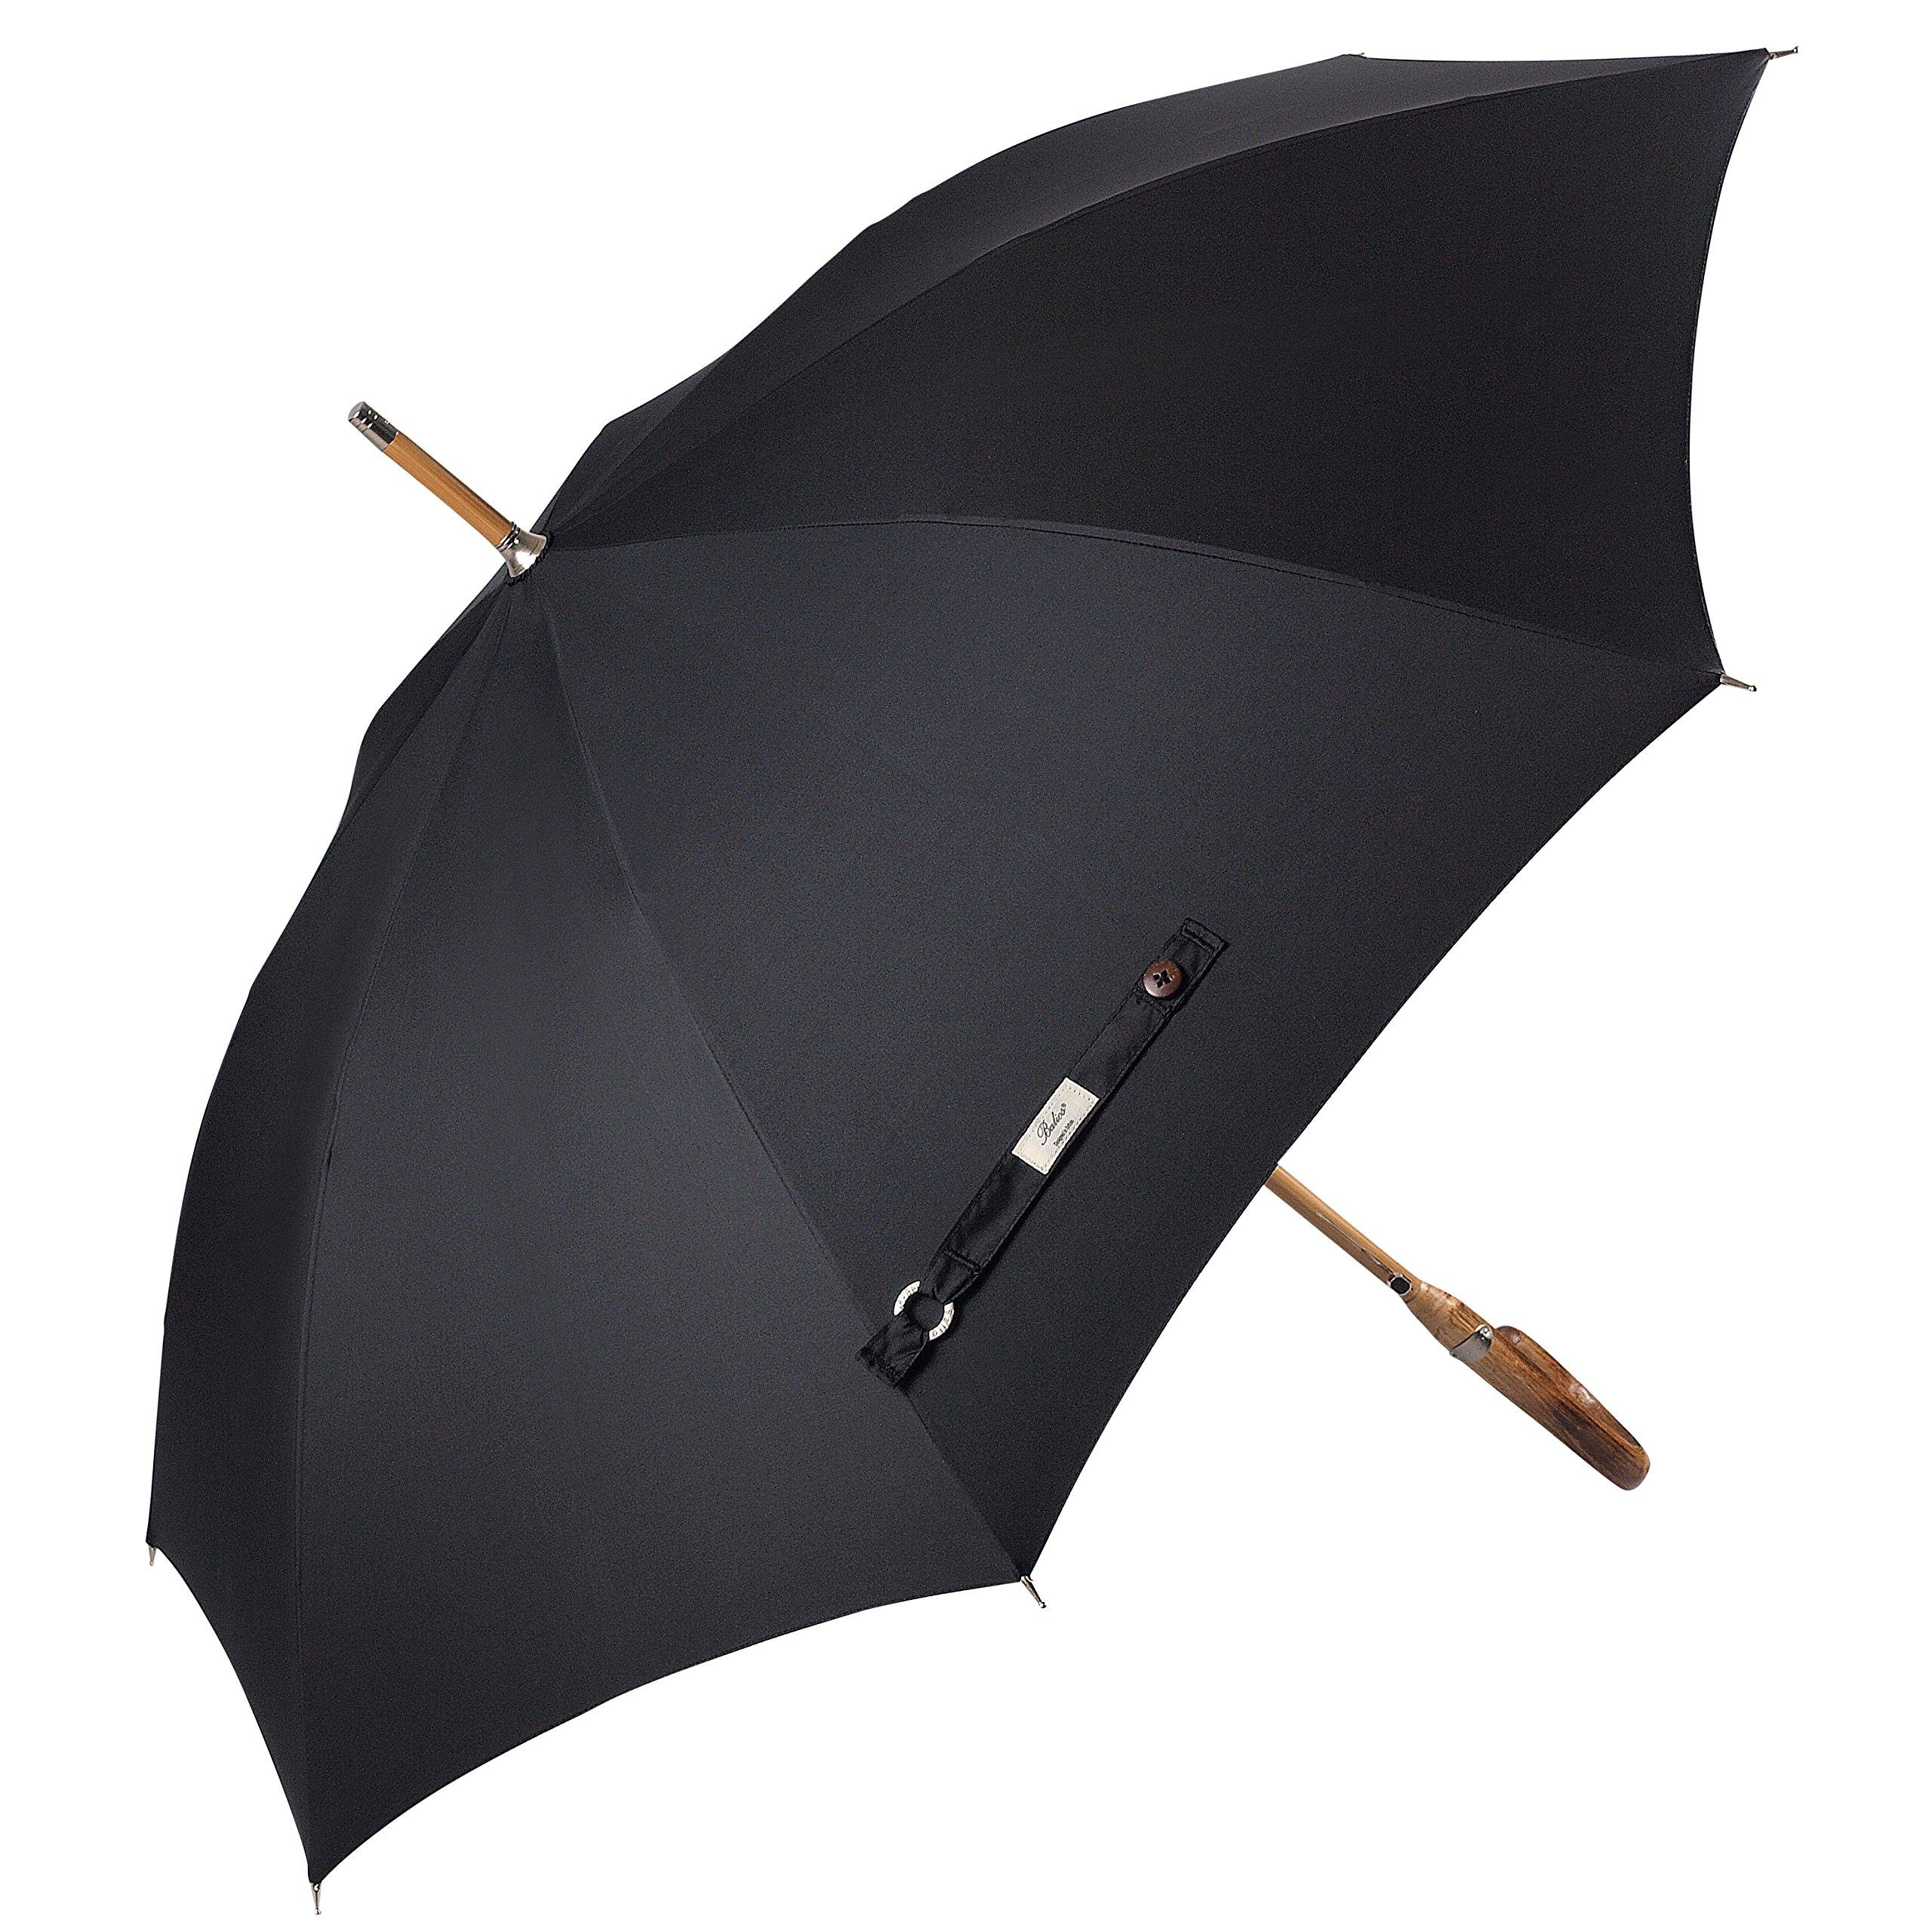 Balios Prestige Walking Umbrella, Real Wood Handle & Bamboo Shaft, Auto Open, Windproof Designed in UK (Jet Black)